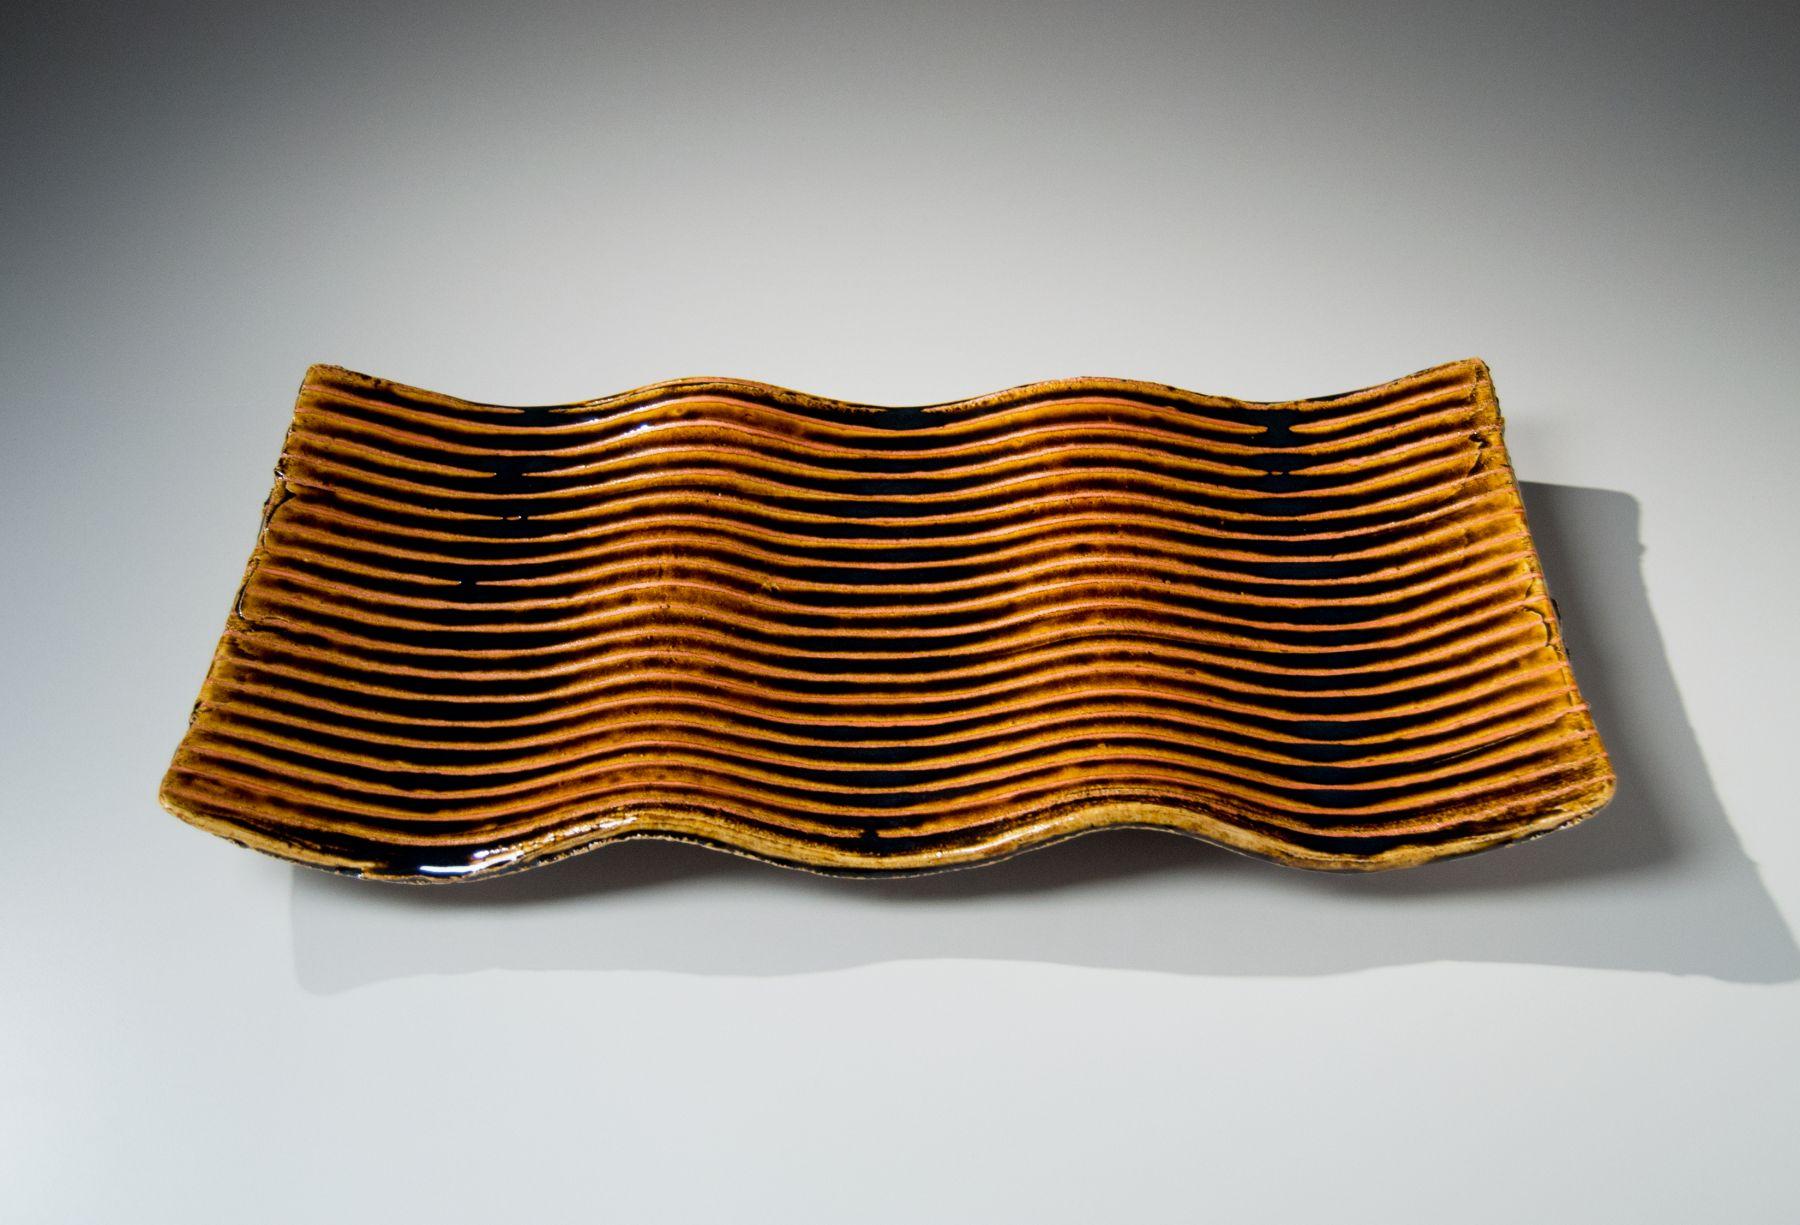 Suzuki, Tetsu, undulating, rectangular, platter, carved, horizontal, linear, stripes, pooling, brown, red, iron, glaze, stoneware, clay, ceramics, pottery, foot, contemporary, japan, japanese, art, mirviss, gallery